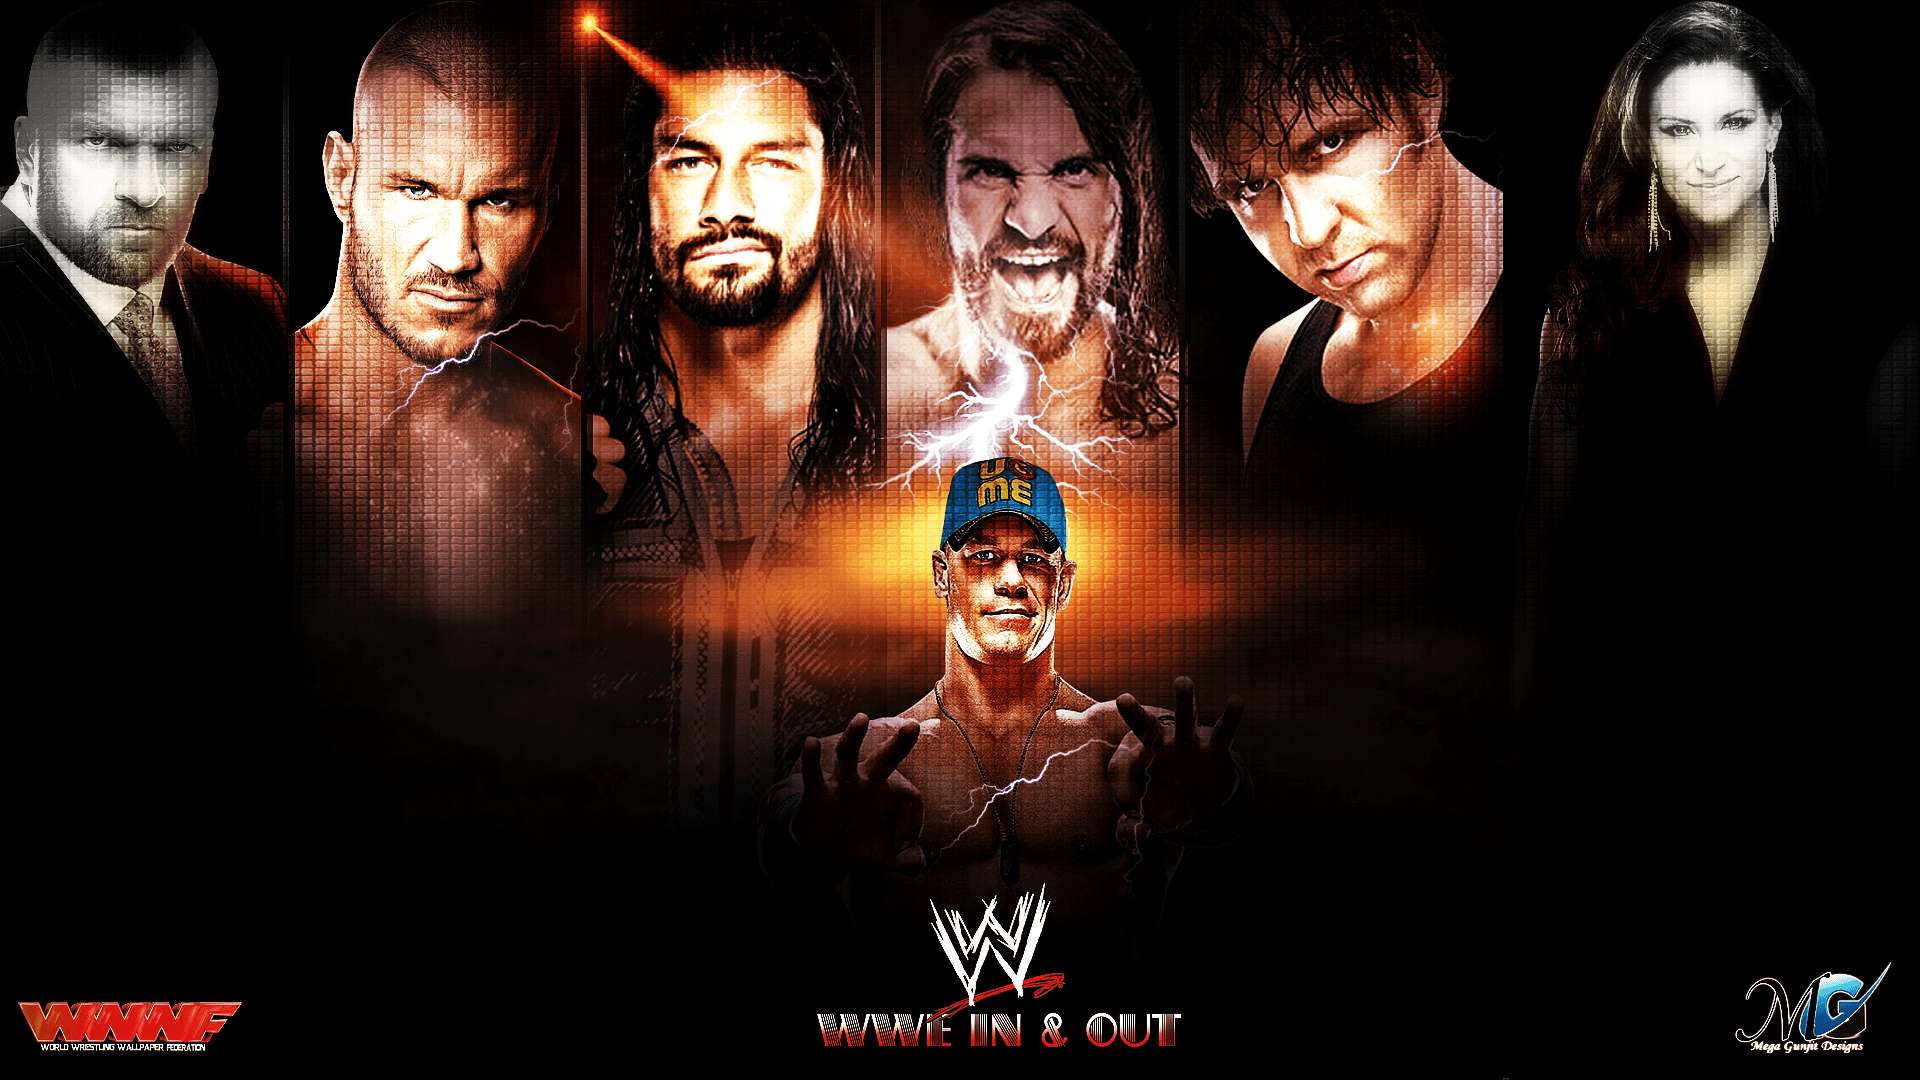 WWE Logo Wallpapers 2016 1920x1080